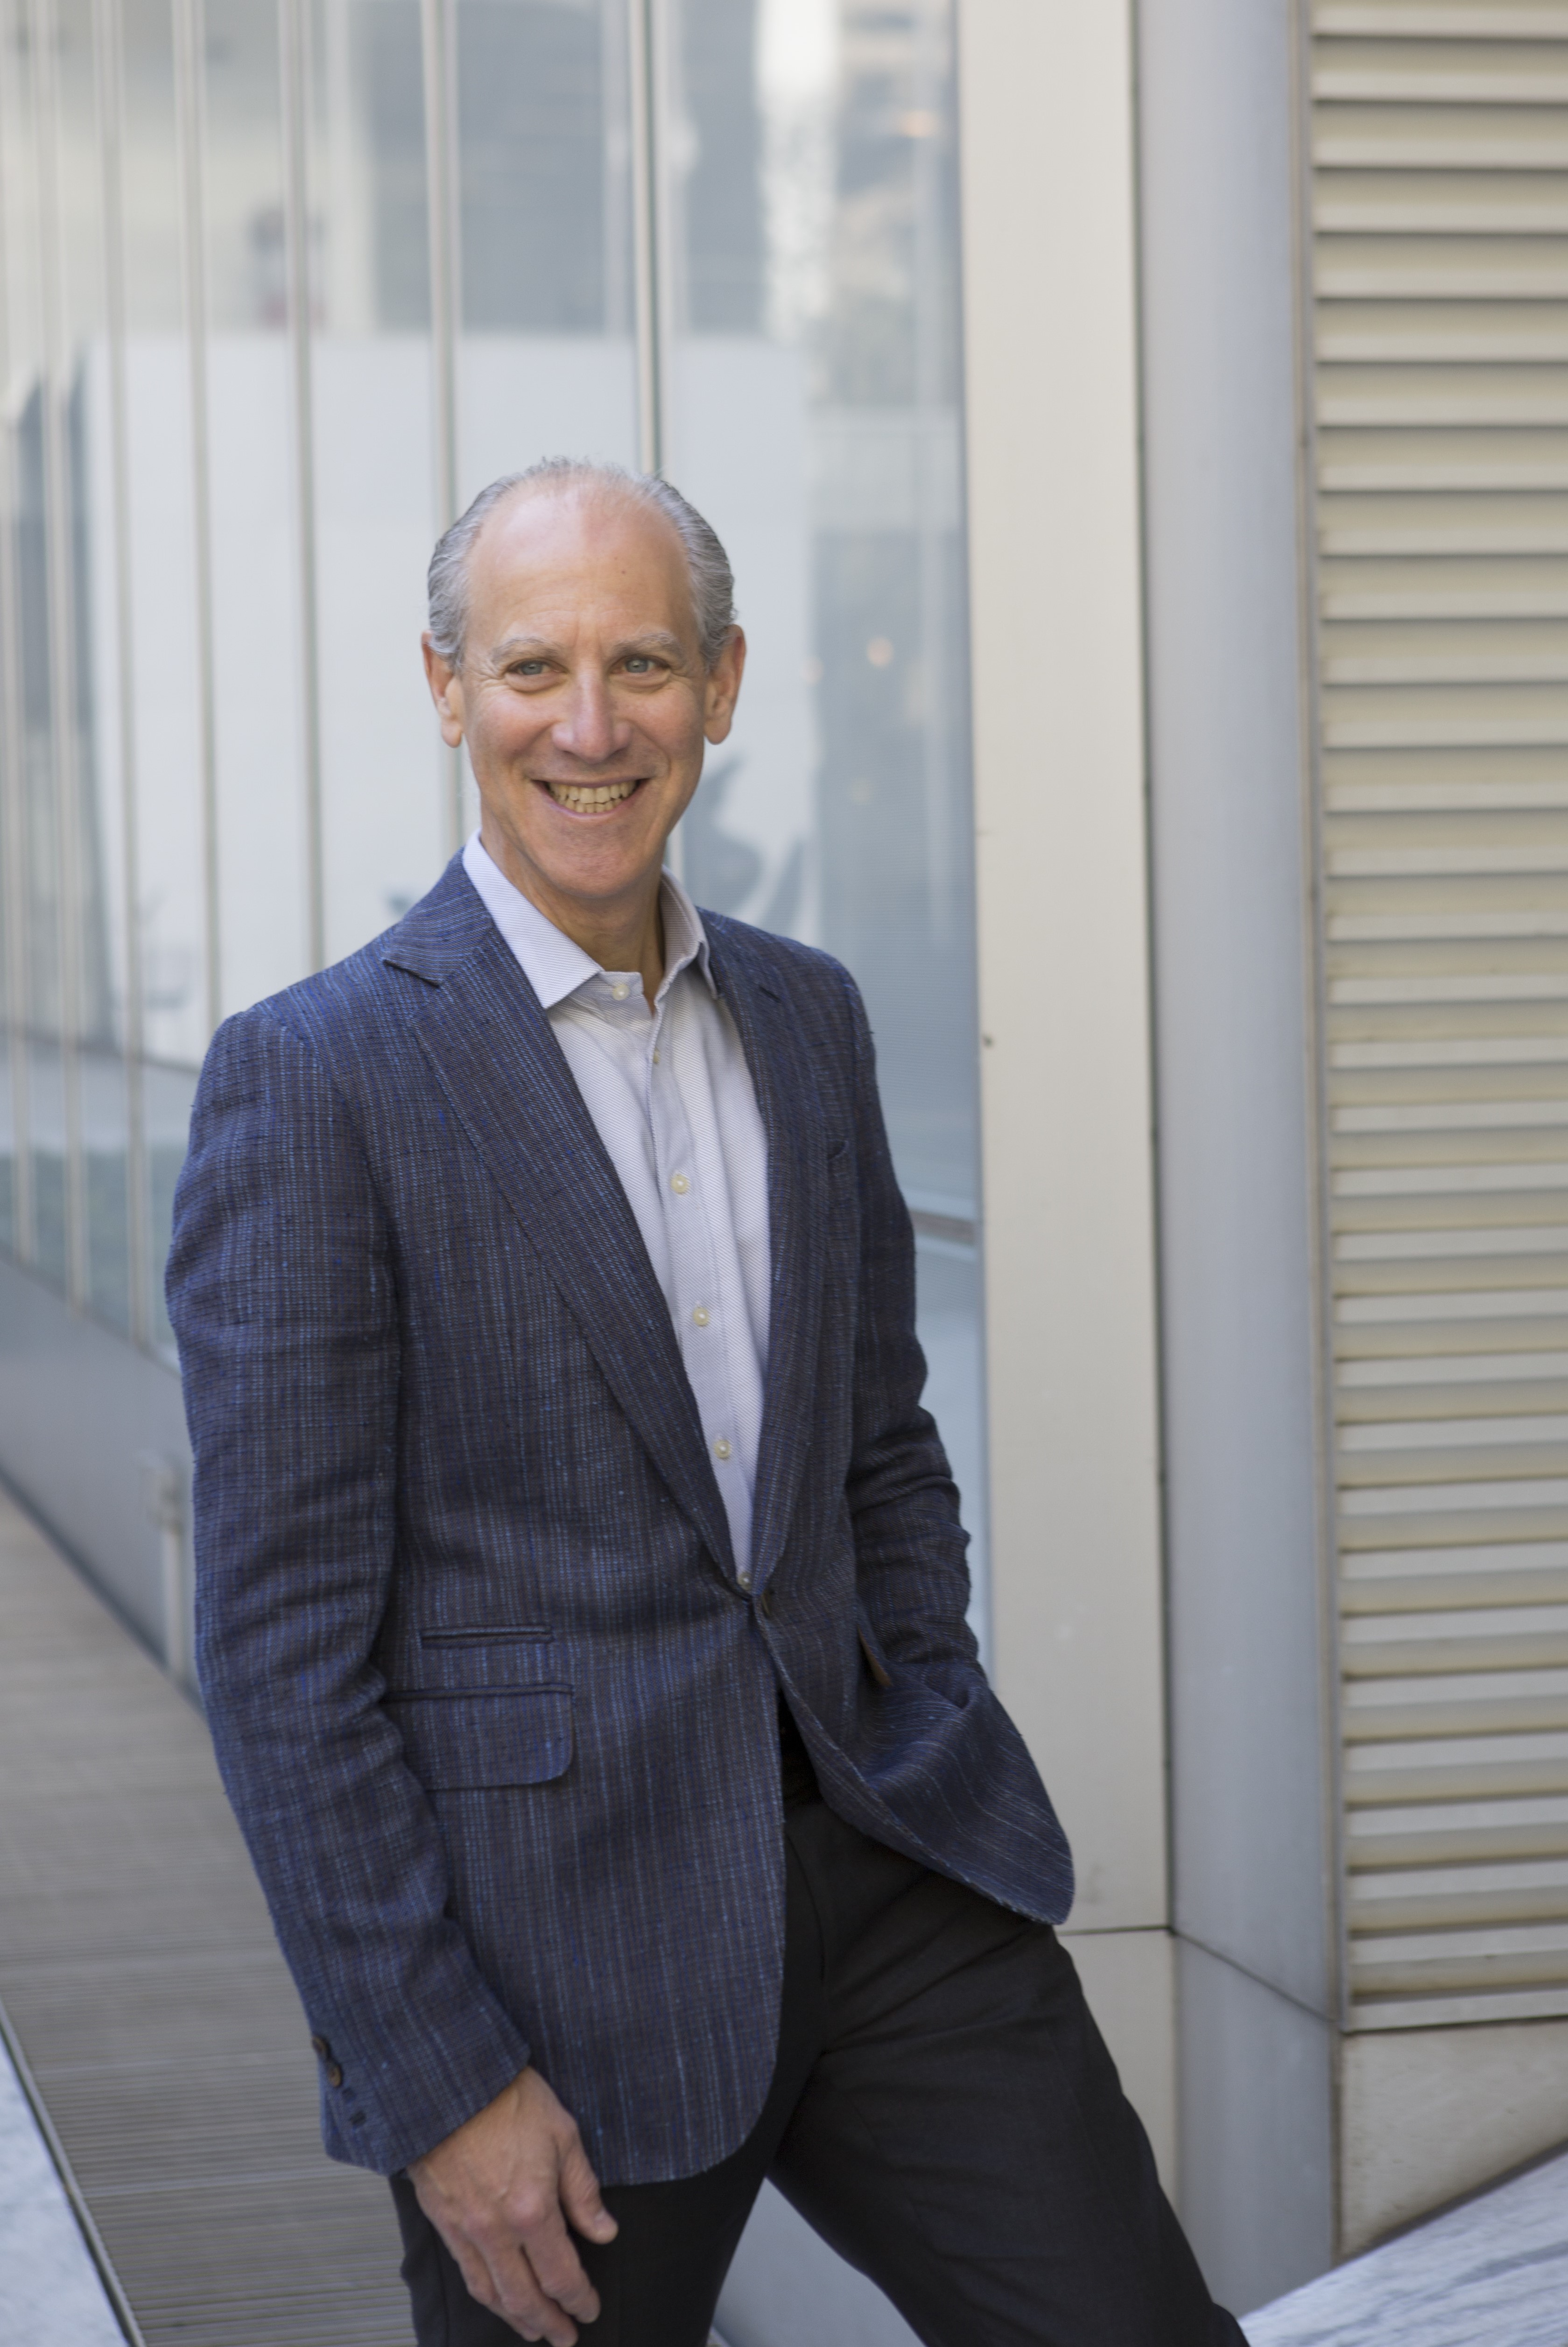 Robert Rauschenberg Foundation Adds A.C. Hudgins, Kellie Jones, Glenn Lowry to Board